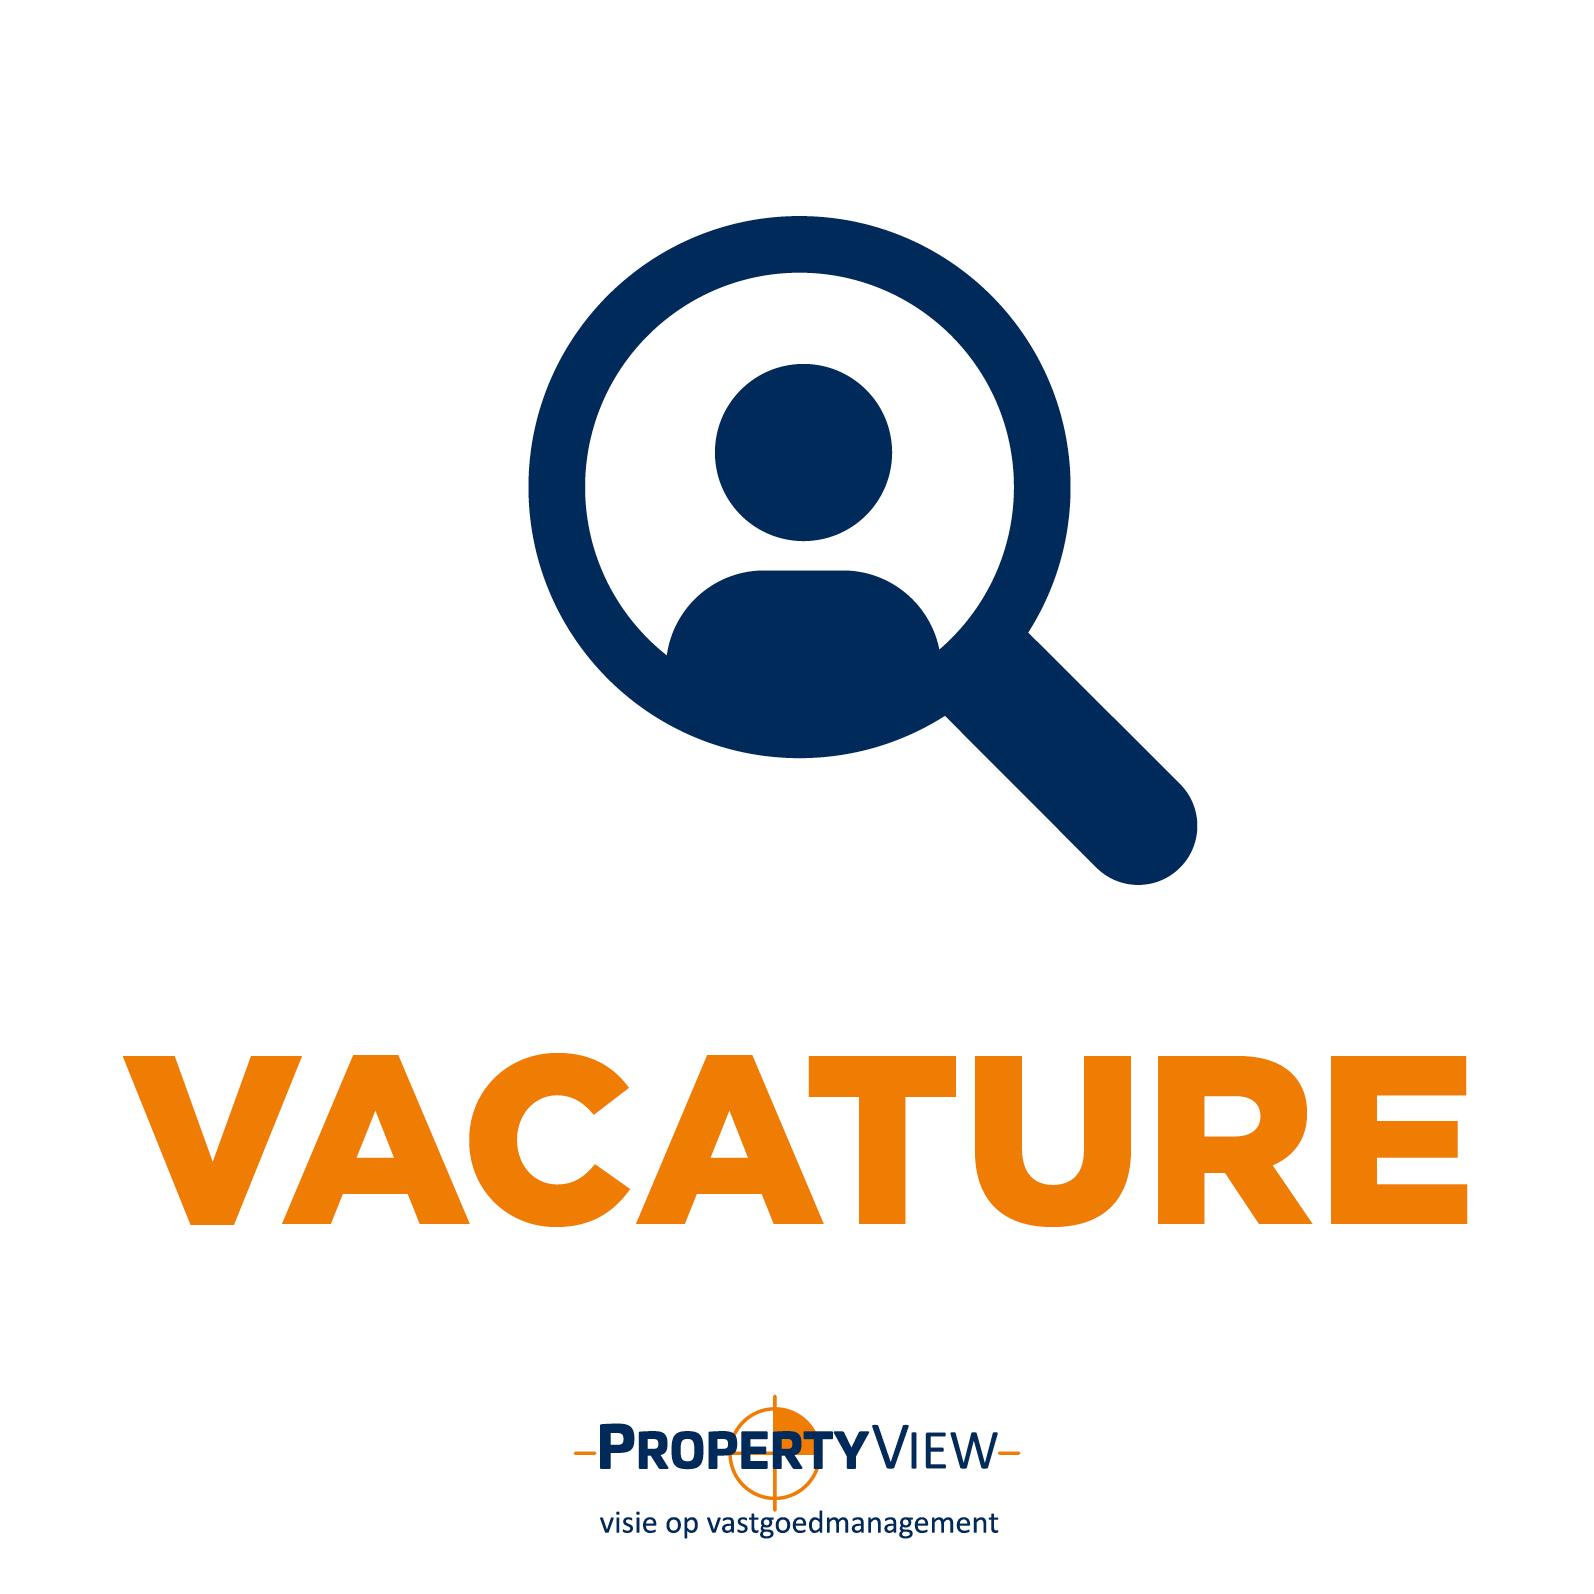 Vacature Administrateur vastgoedportefeuille / Portefeuille administrateur MBO (Haarlem)